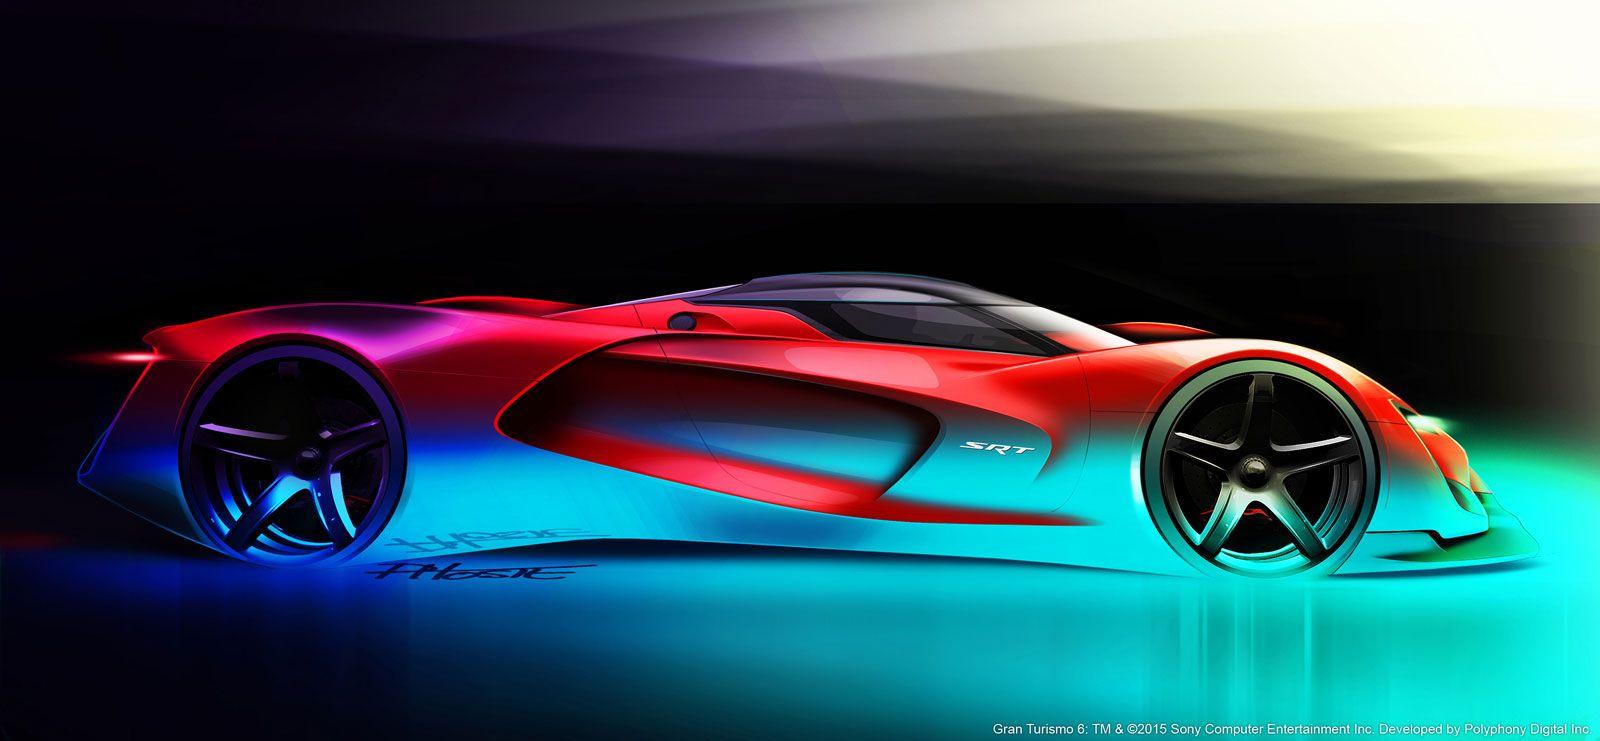 Srt Tomahawk Vision Gran Turismo Concept Design Sketch Super Cars Car Exterior Srt